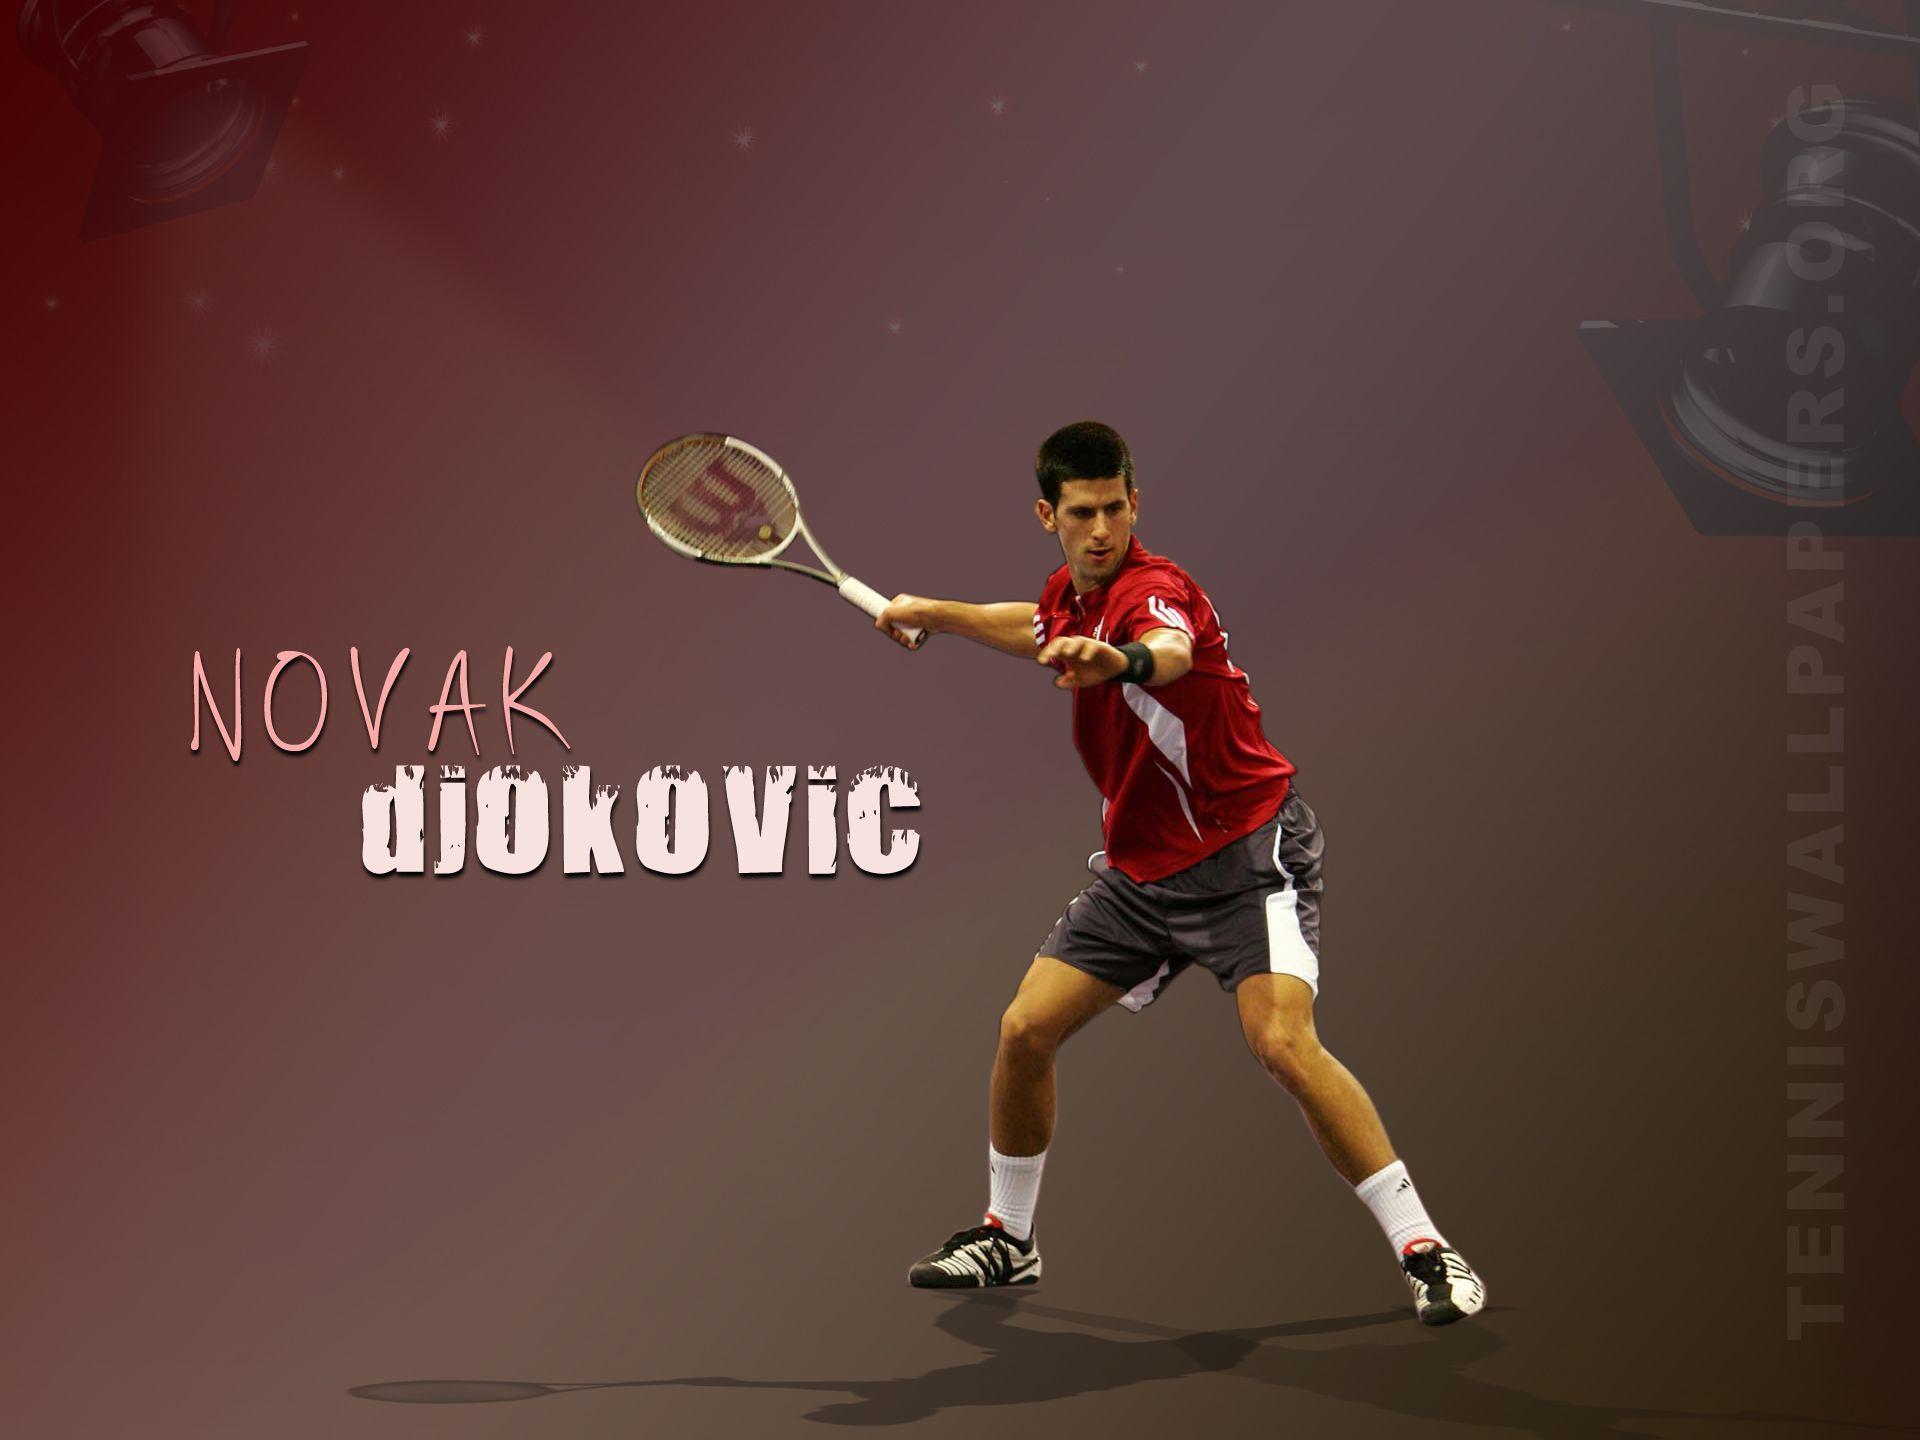 Djokovic Wallpapers 1920x1440